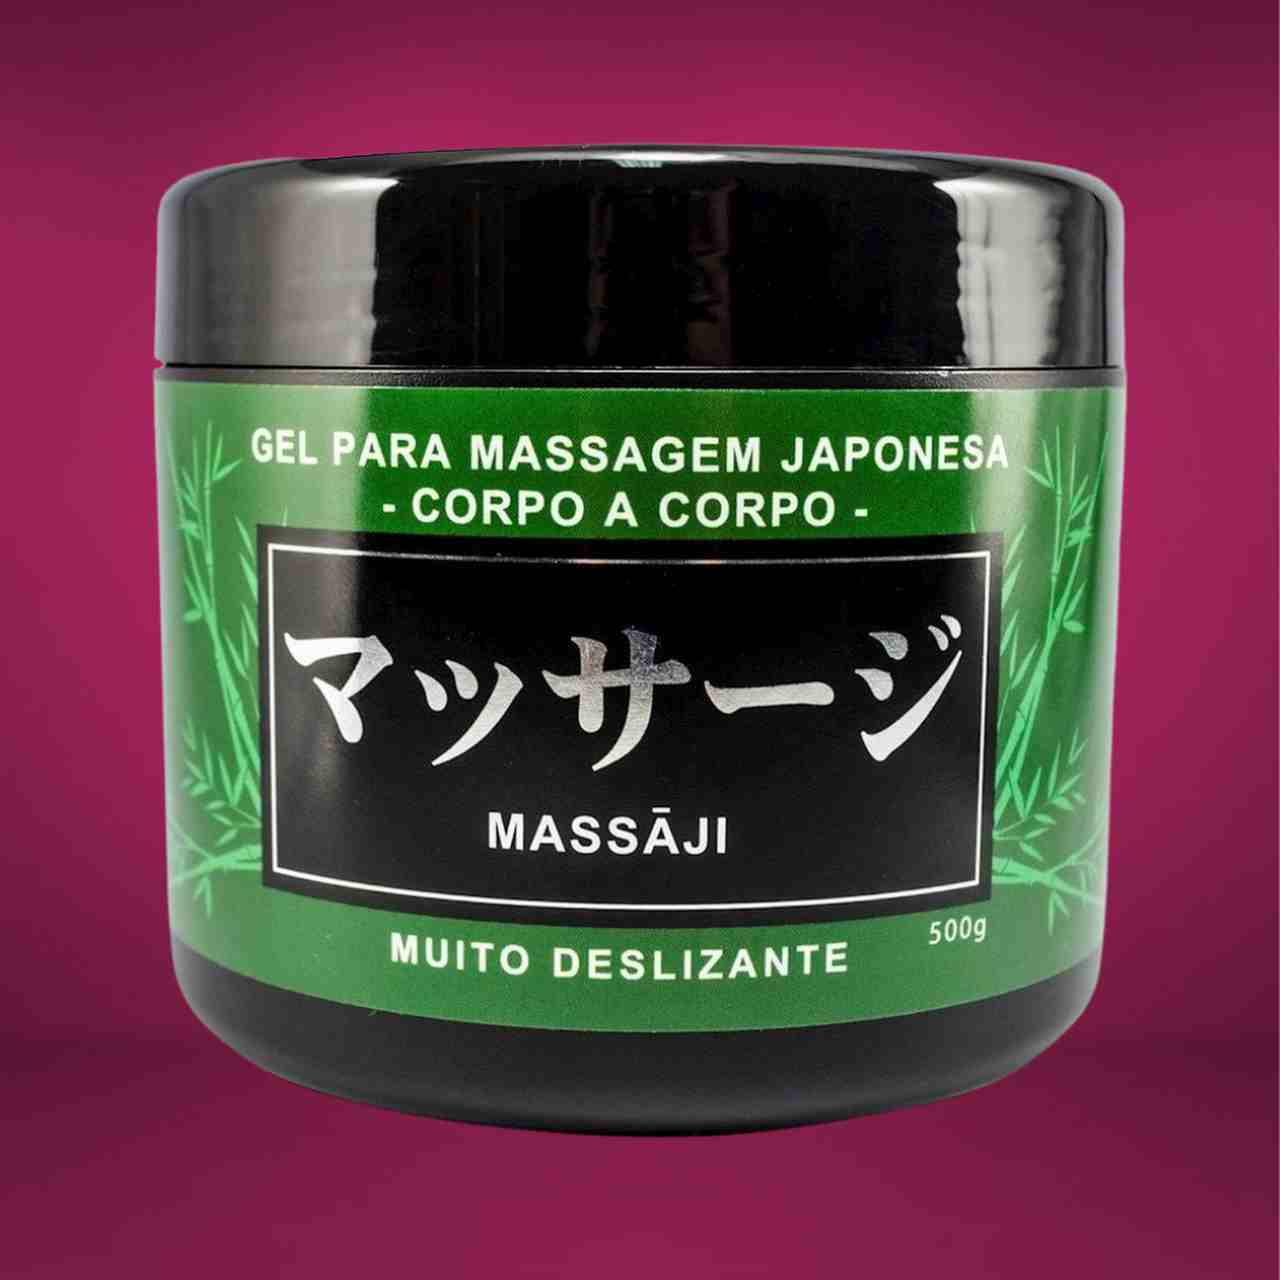 Massaji Gel Massagem Corpo a Corpo 500g Hot Flowers